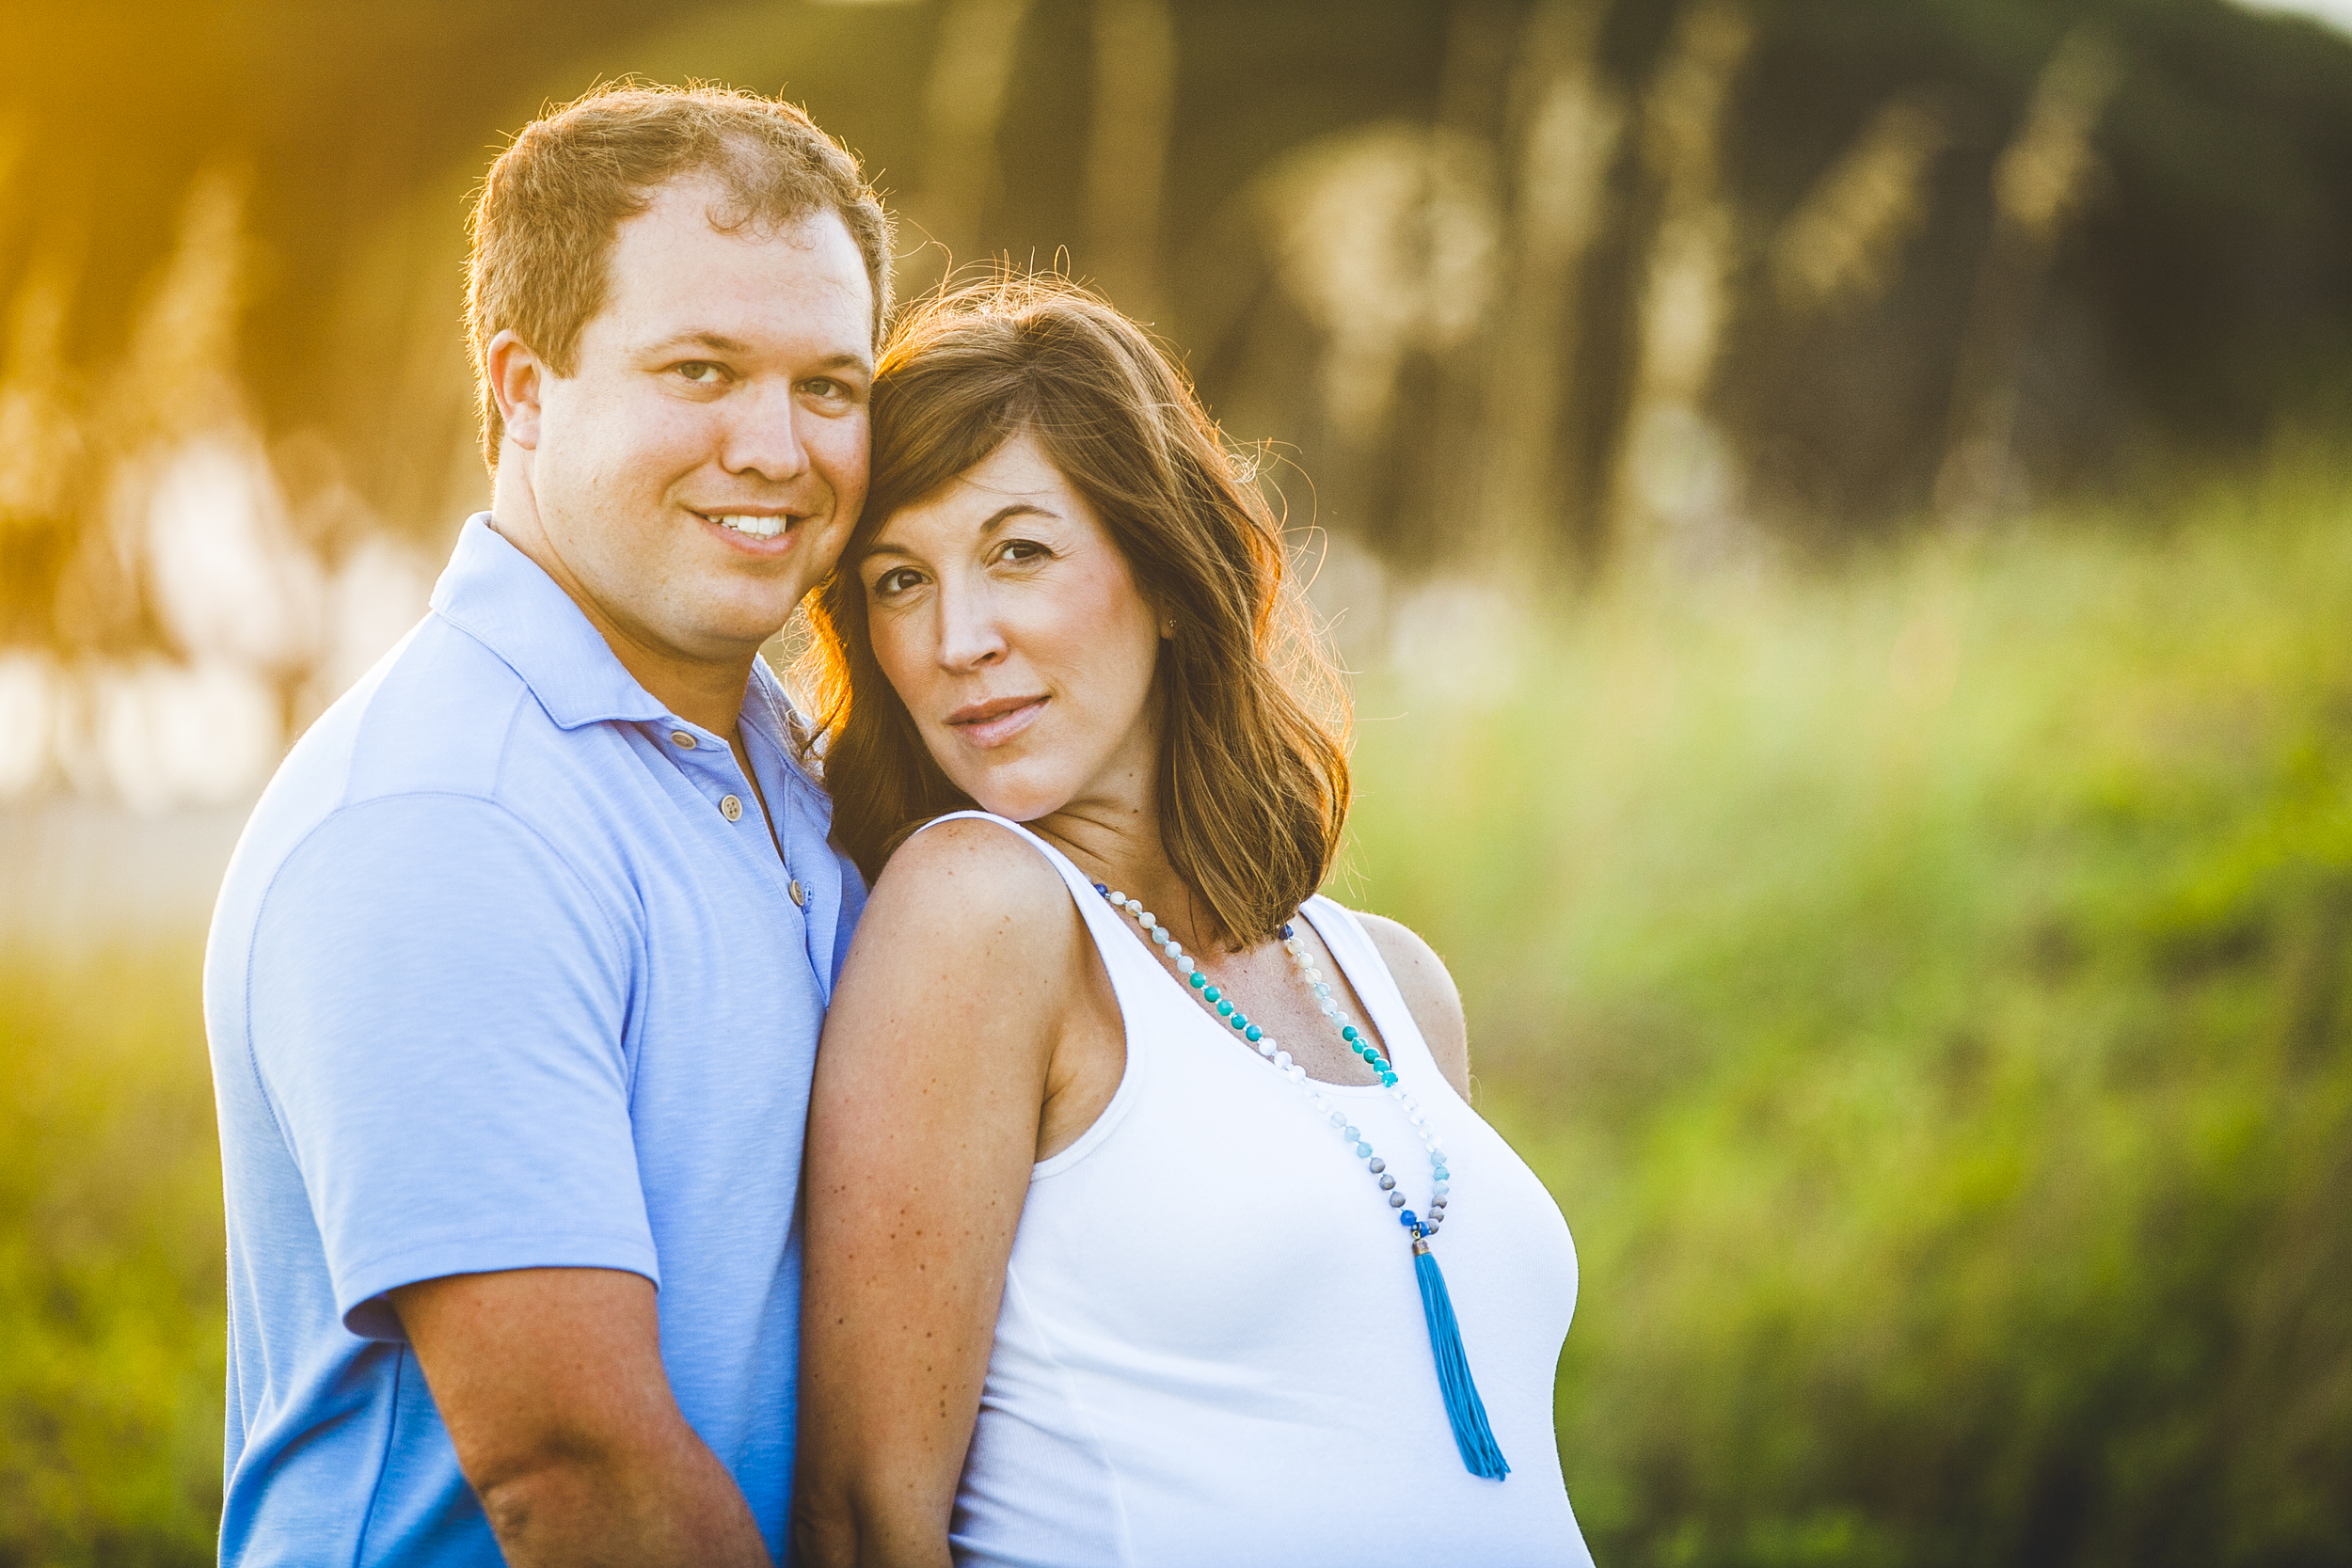 North Carolina Maternity Session